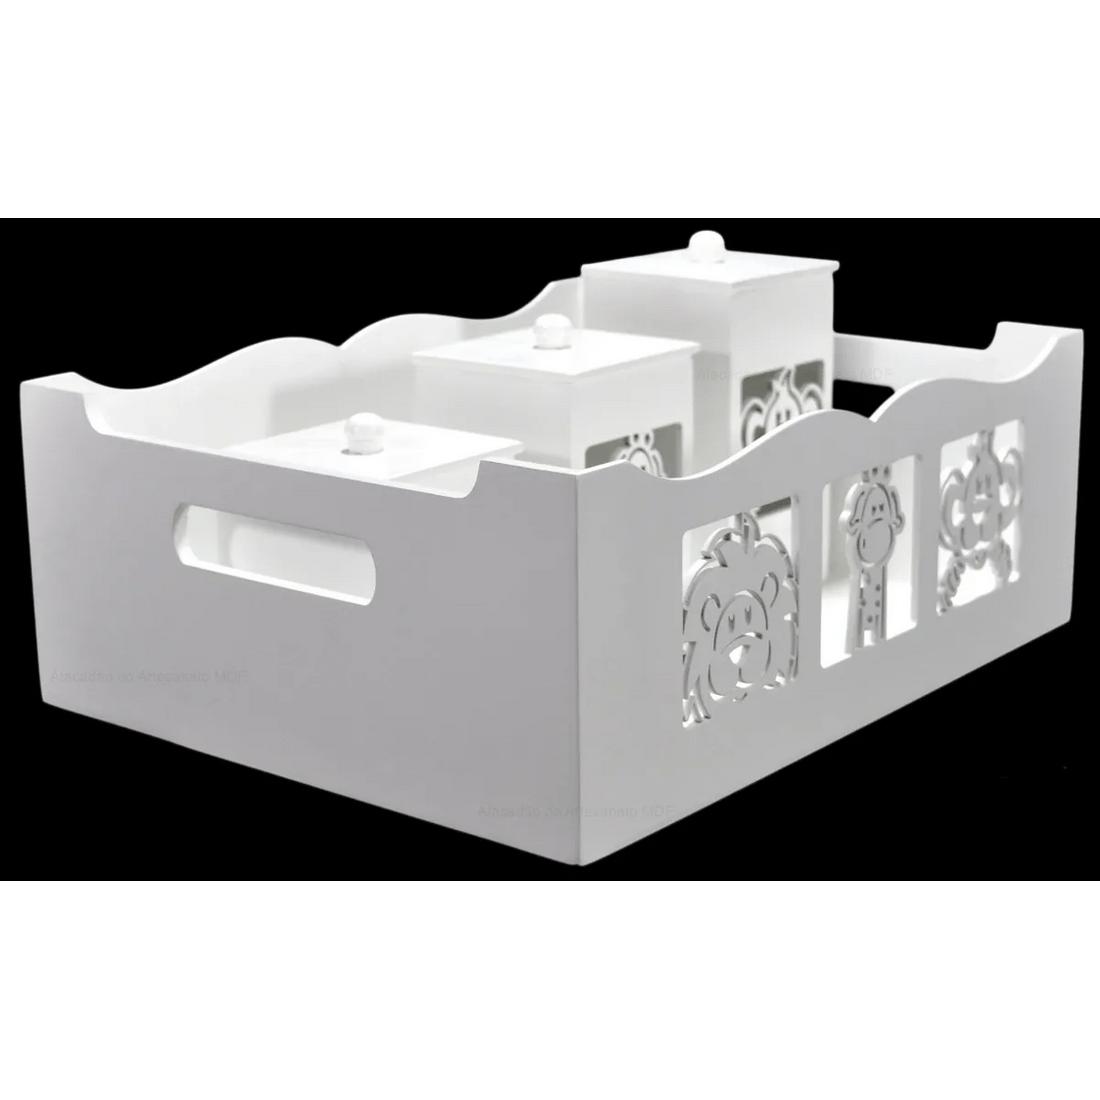 Kit-Bebe-Safari-Sem-Lixeira-7pc-MDF-Pintado